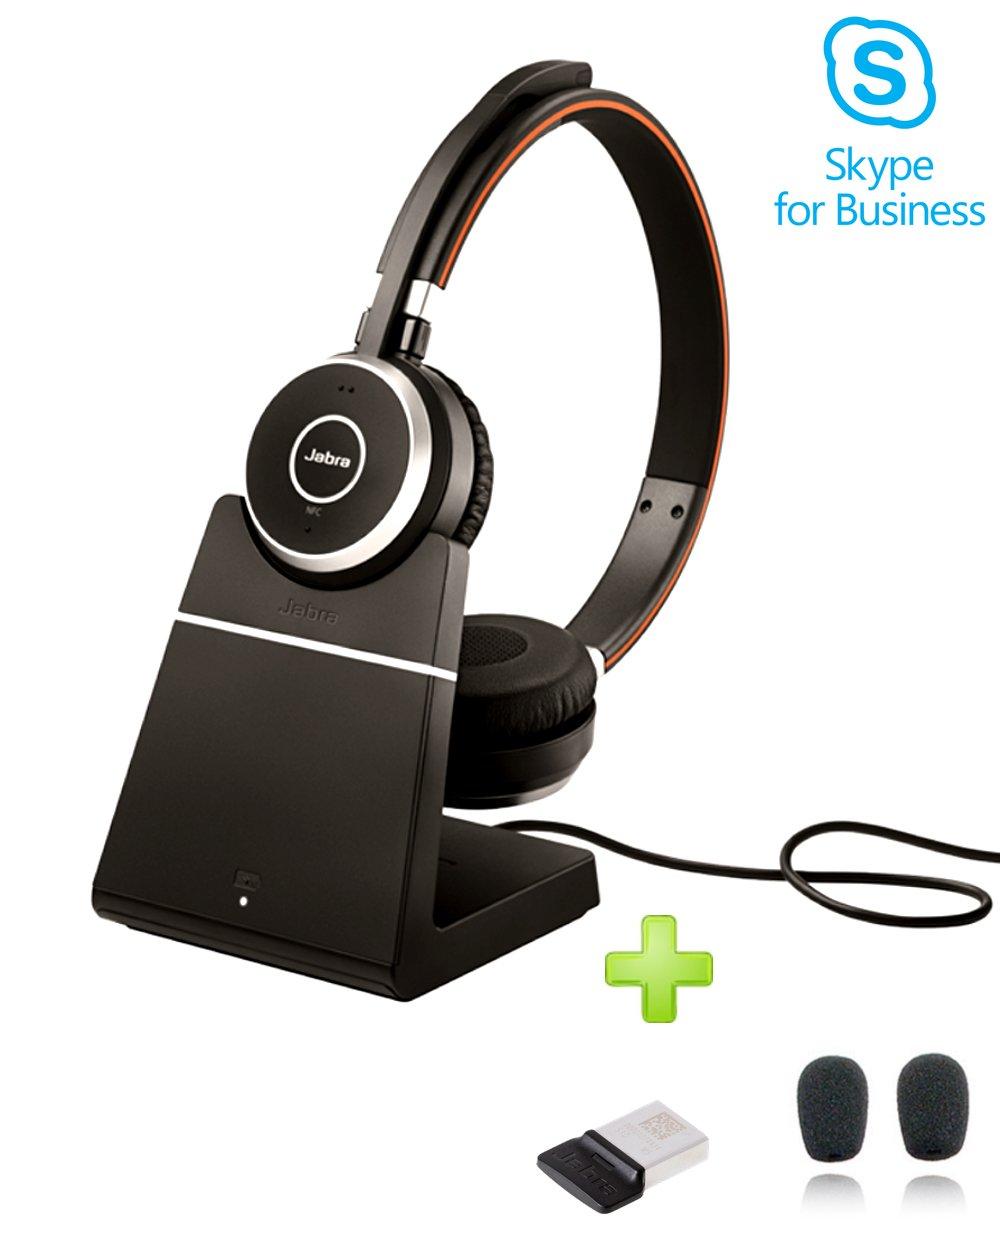 Jabra Evolve 65 Bluetooth Stereo Headset Bundle | MS Version | Bonus Mic Cushions, USB Dongle, Charging Stand | Compatible with Skype/Lync, Softphones, Smartphones, PC/MAC